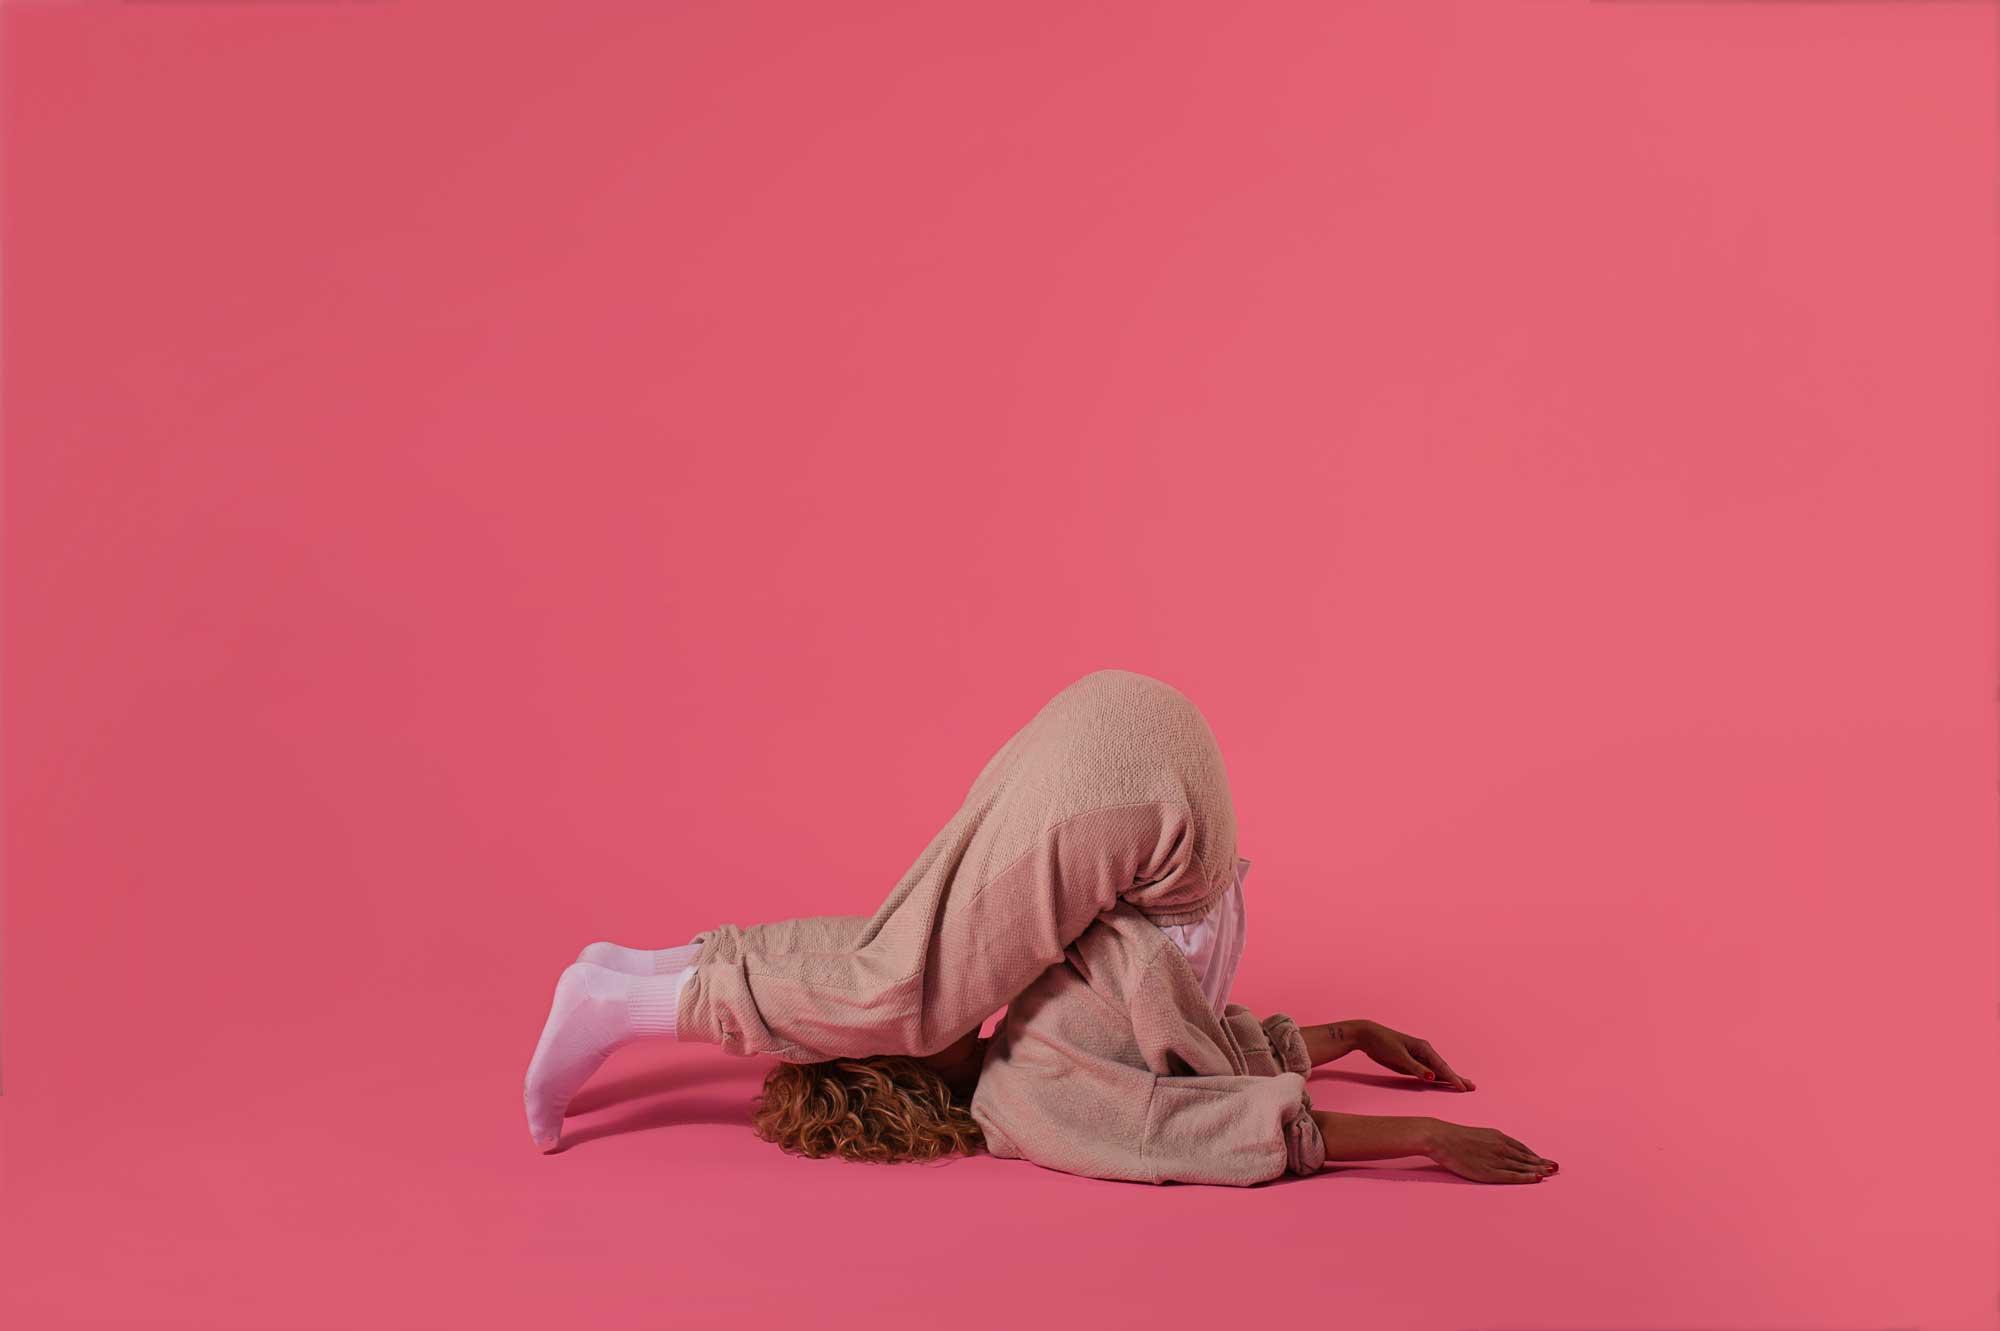 Xani with legs over head